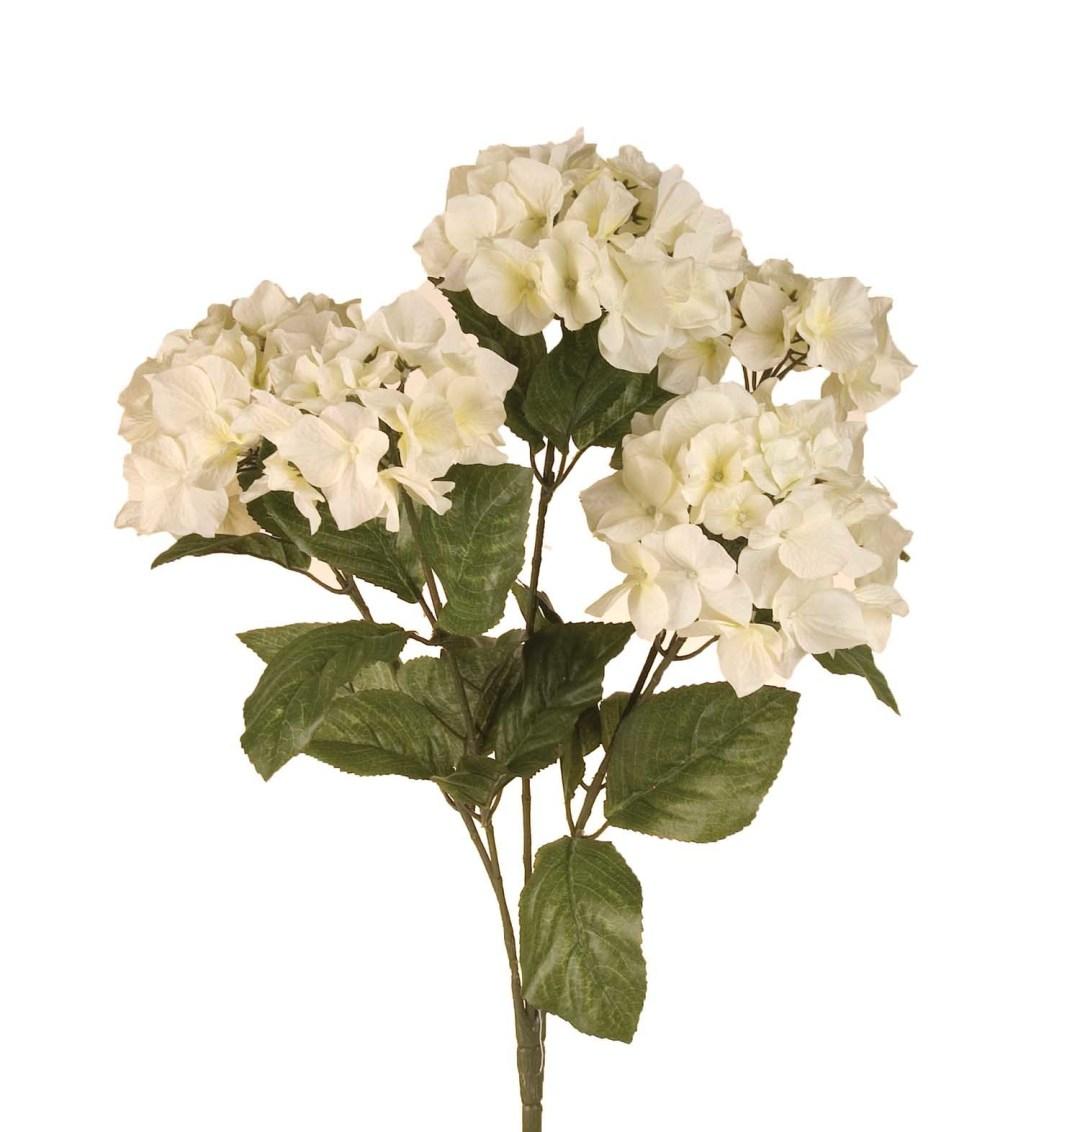 "SB0301CREAM - 23"" Hydrangea Bush x5 $10.95 each SB0301CREAM"